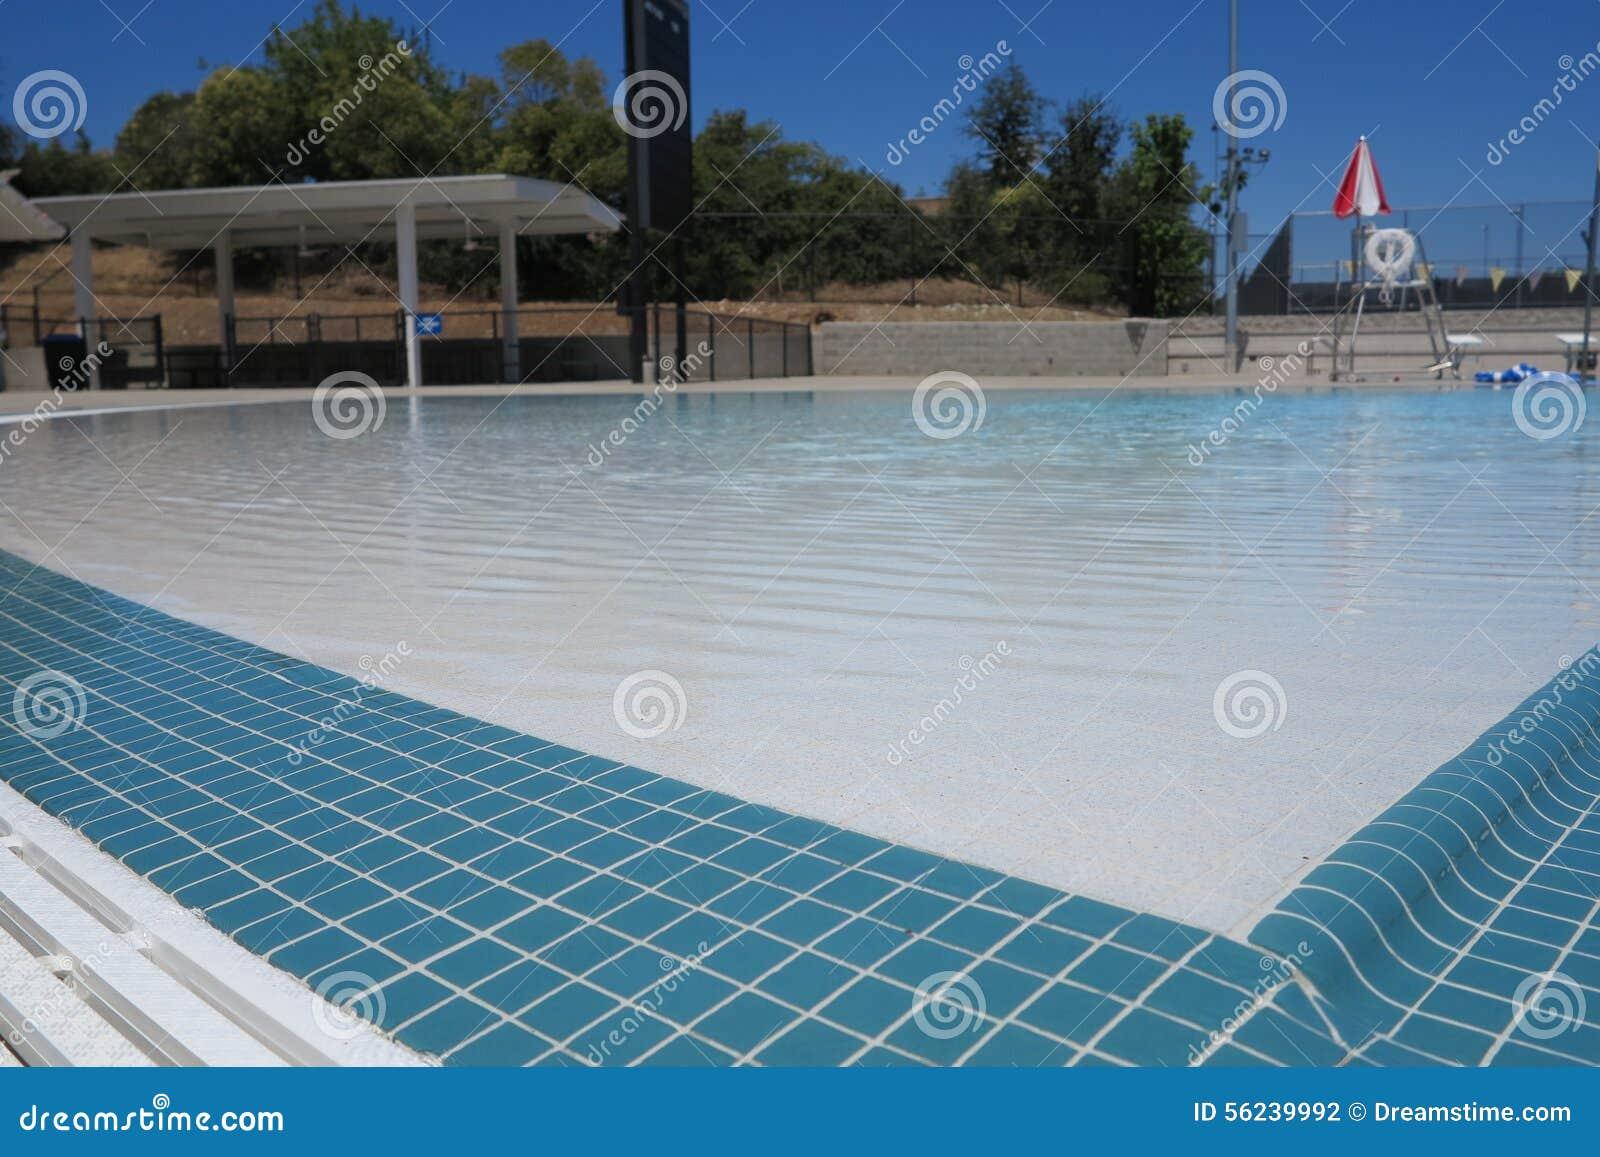 Community swimming pool royalty free stock image 53528830 for Alderwood pool public swim times